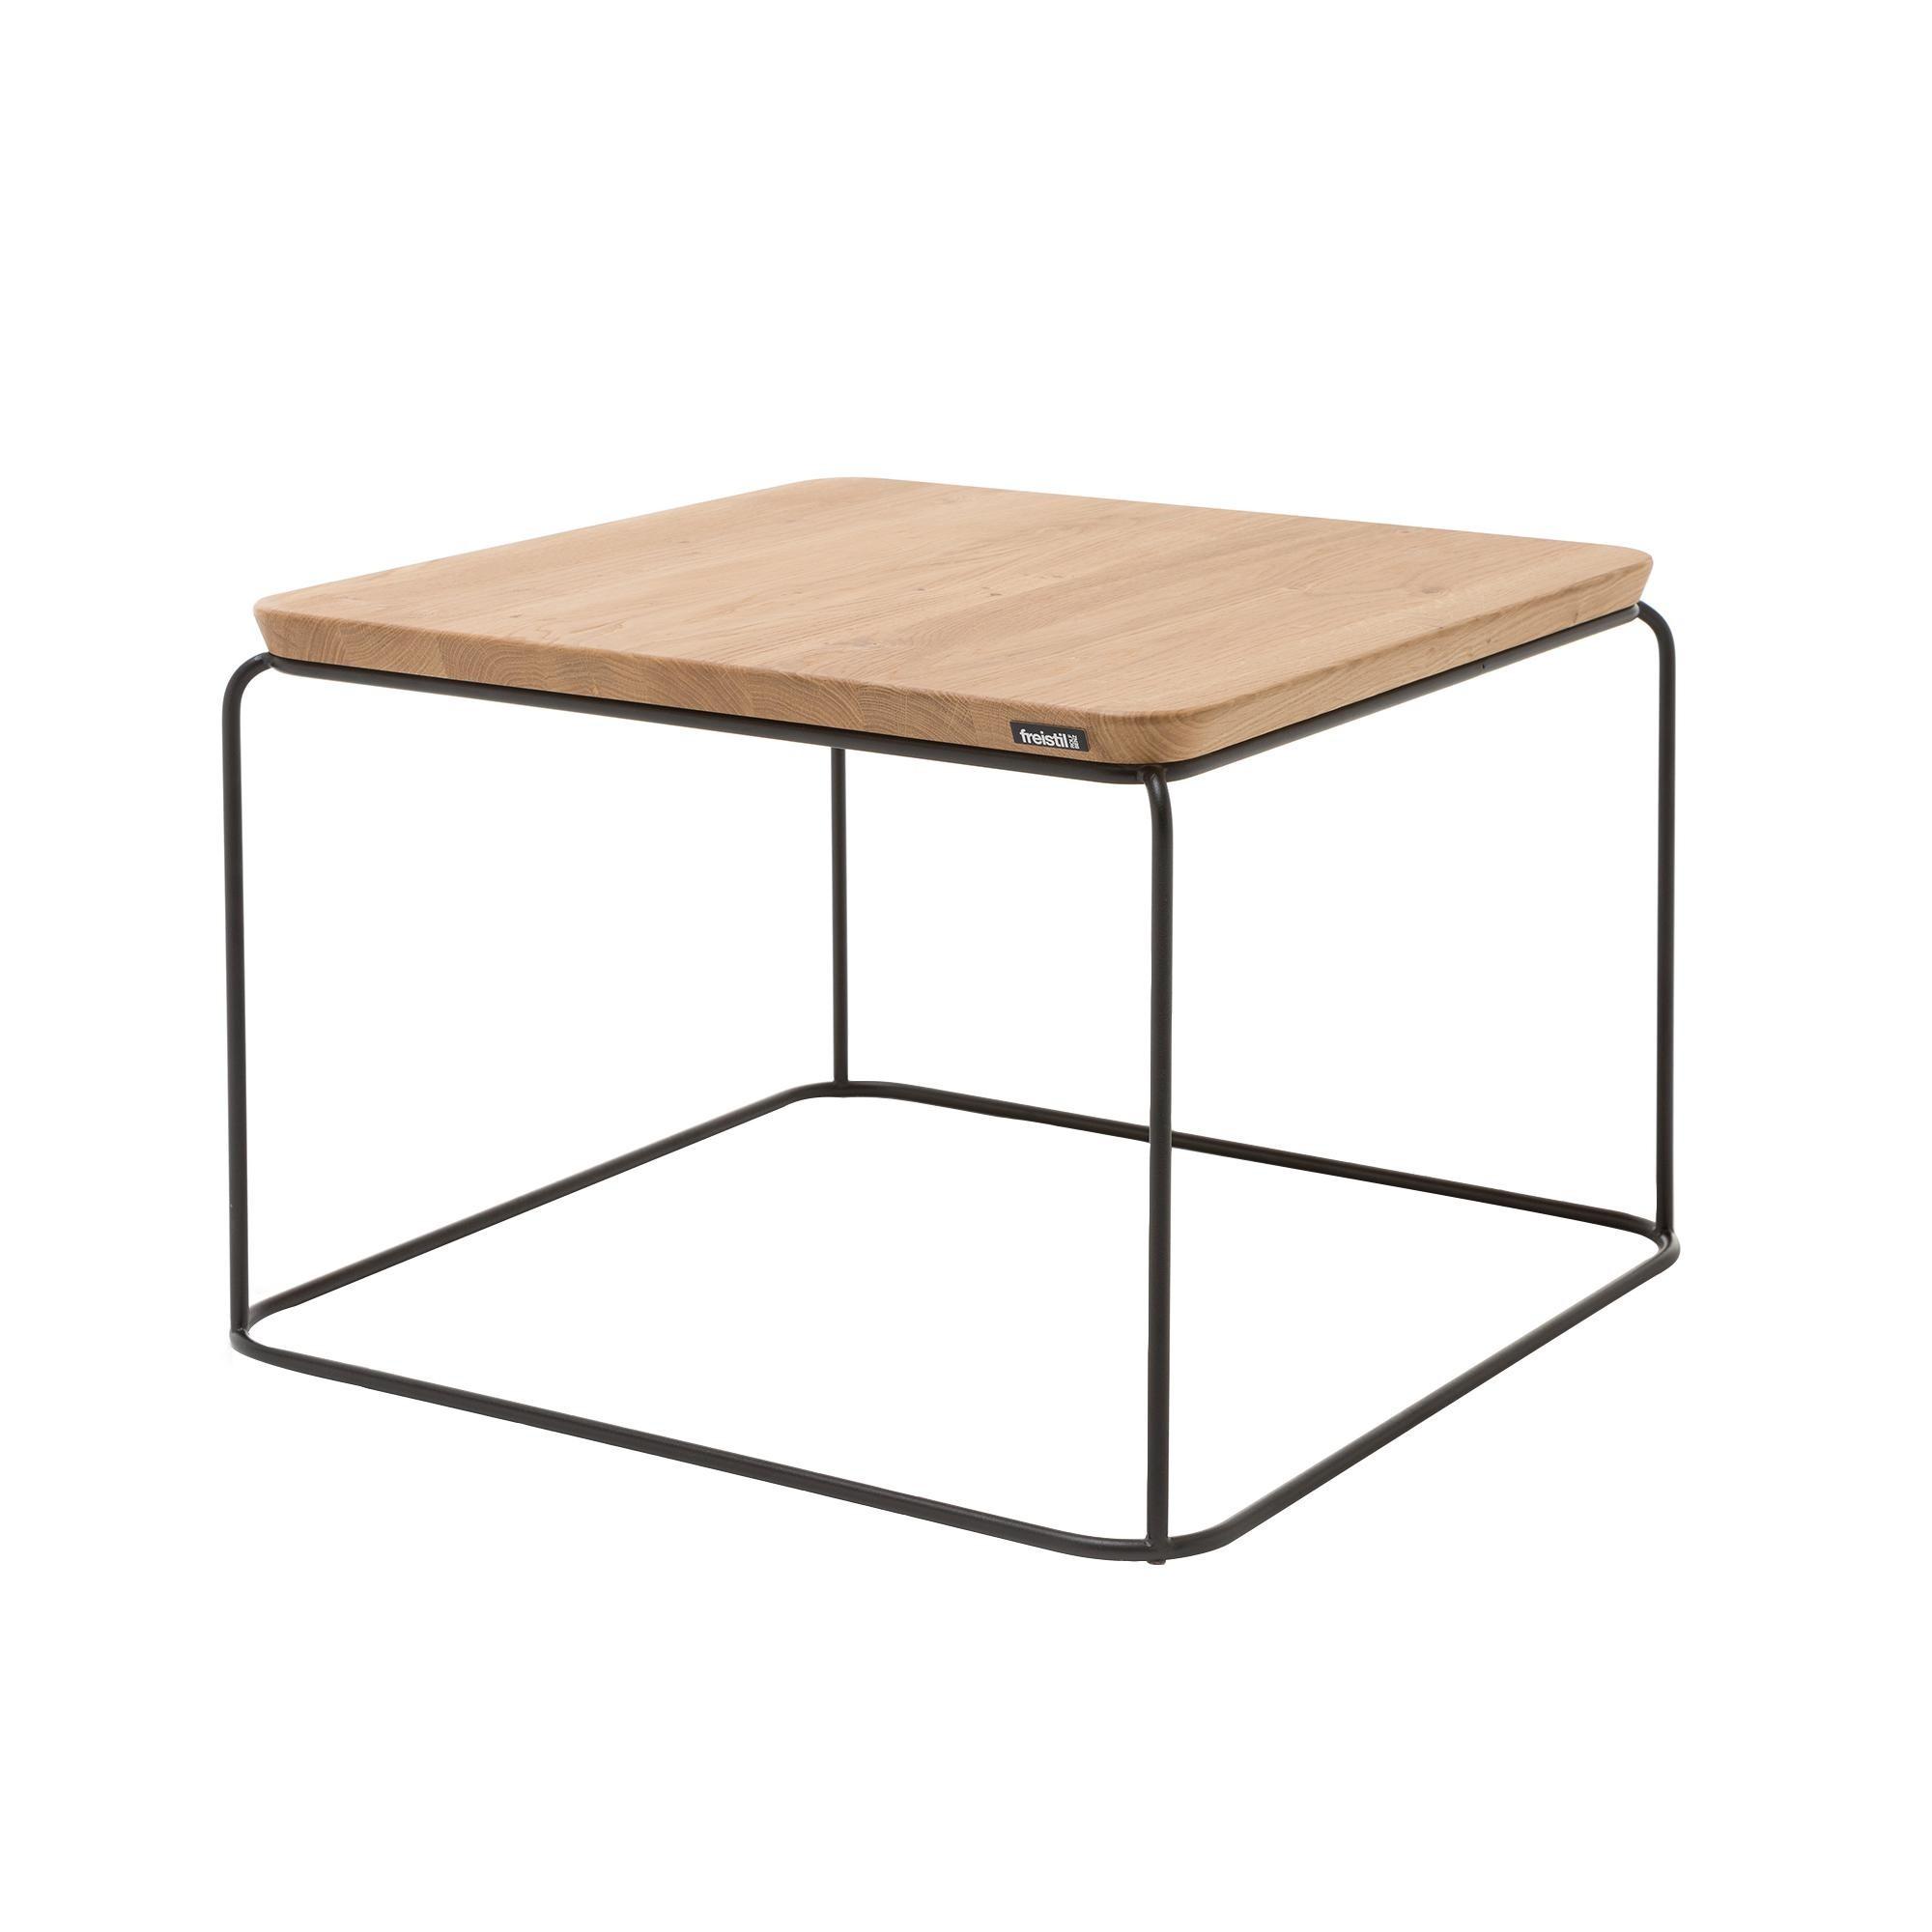 freistil rolf benz freistil 151 couchtisch rechteckig. Black Bedroom Furniture Sets. Home Design Ideas